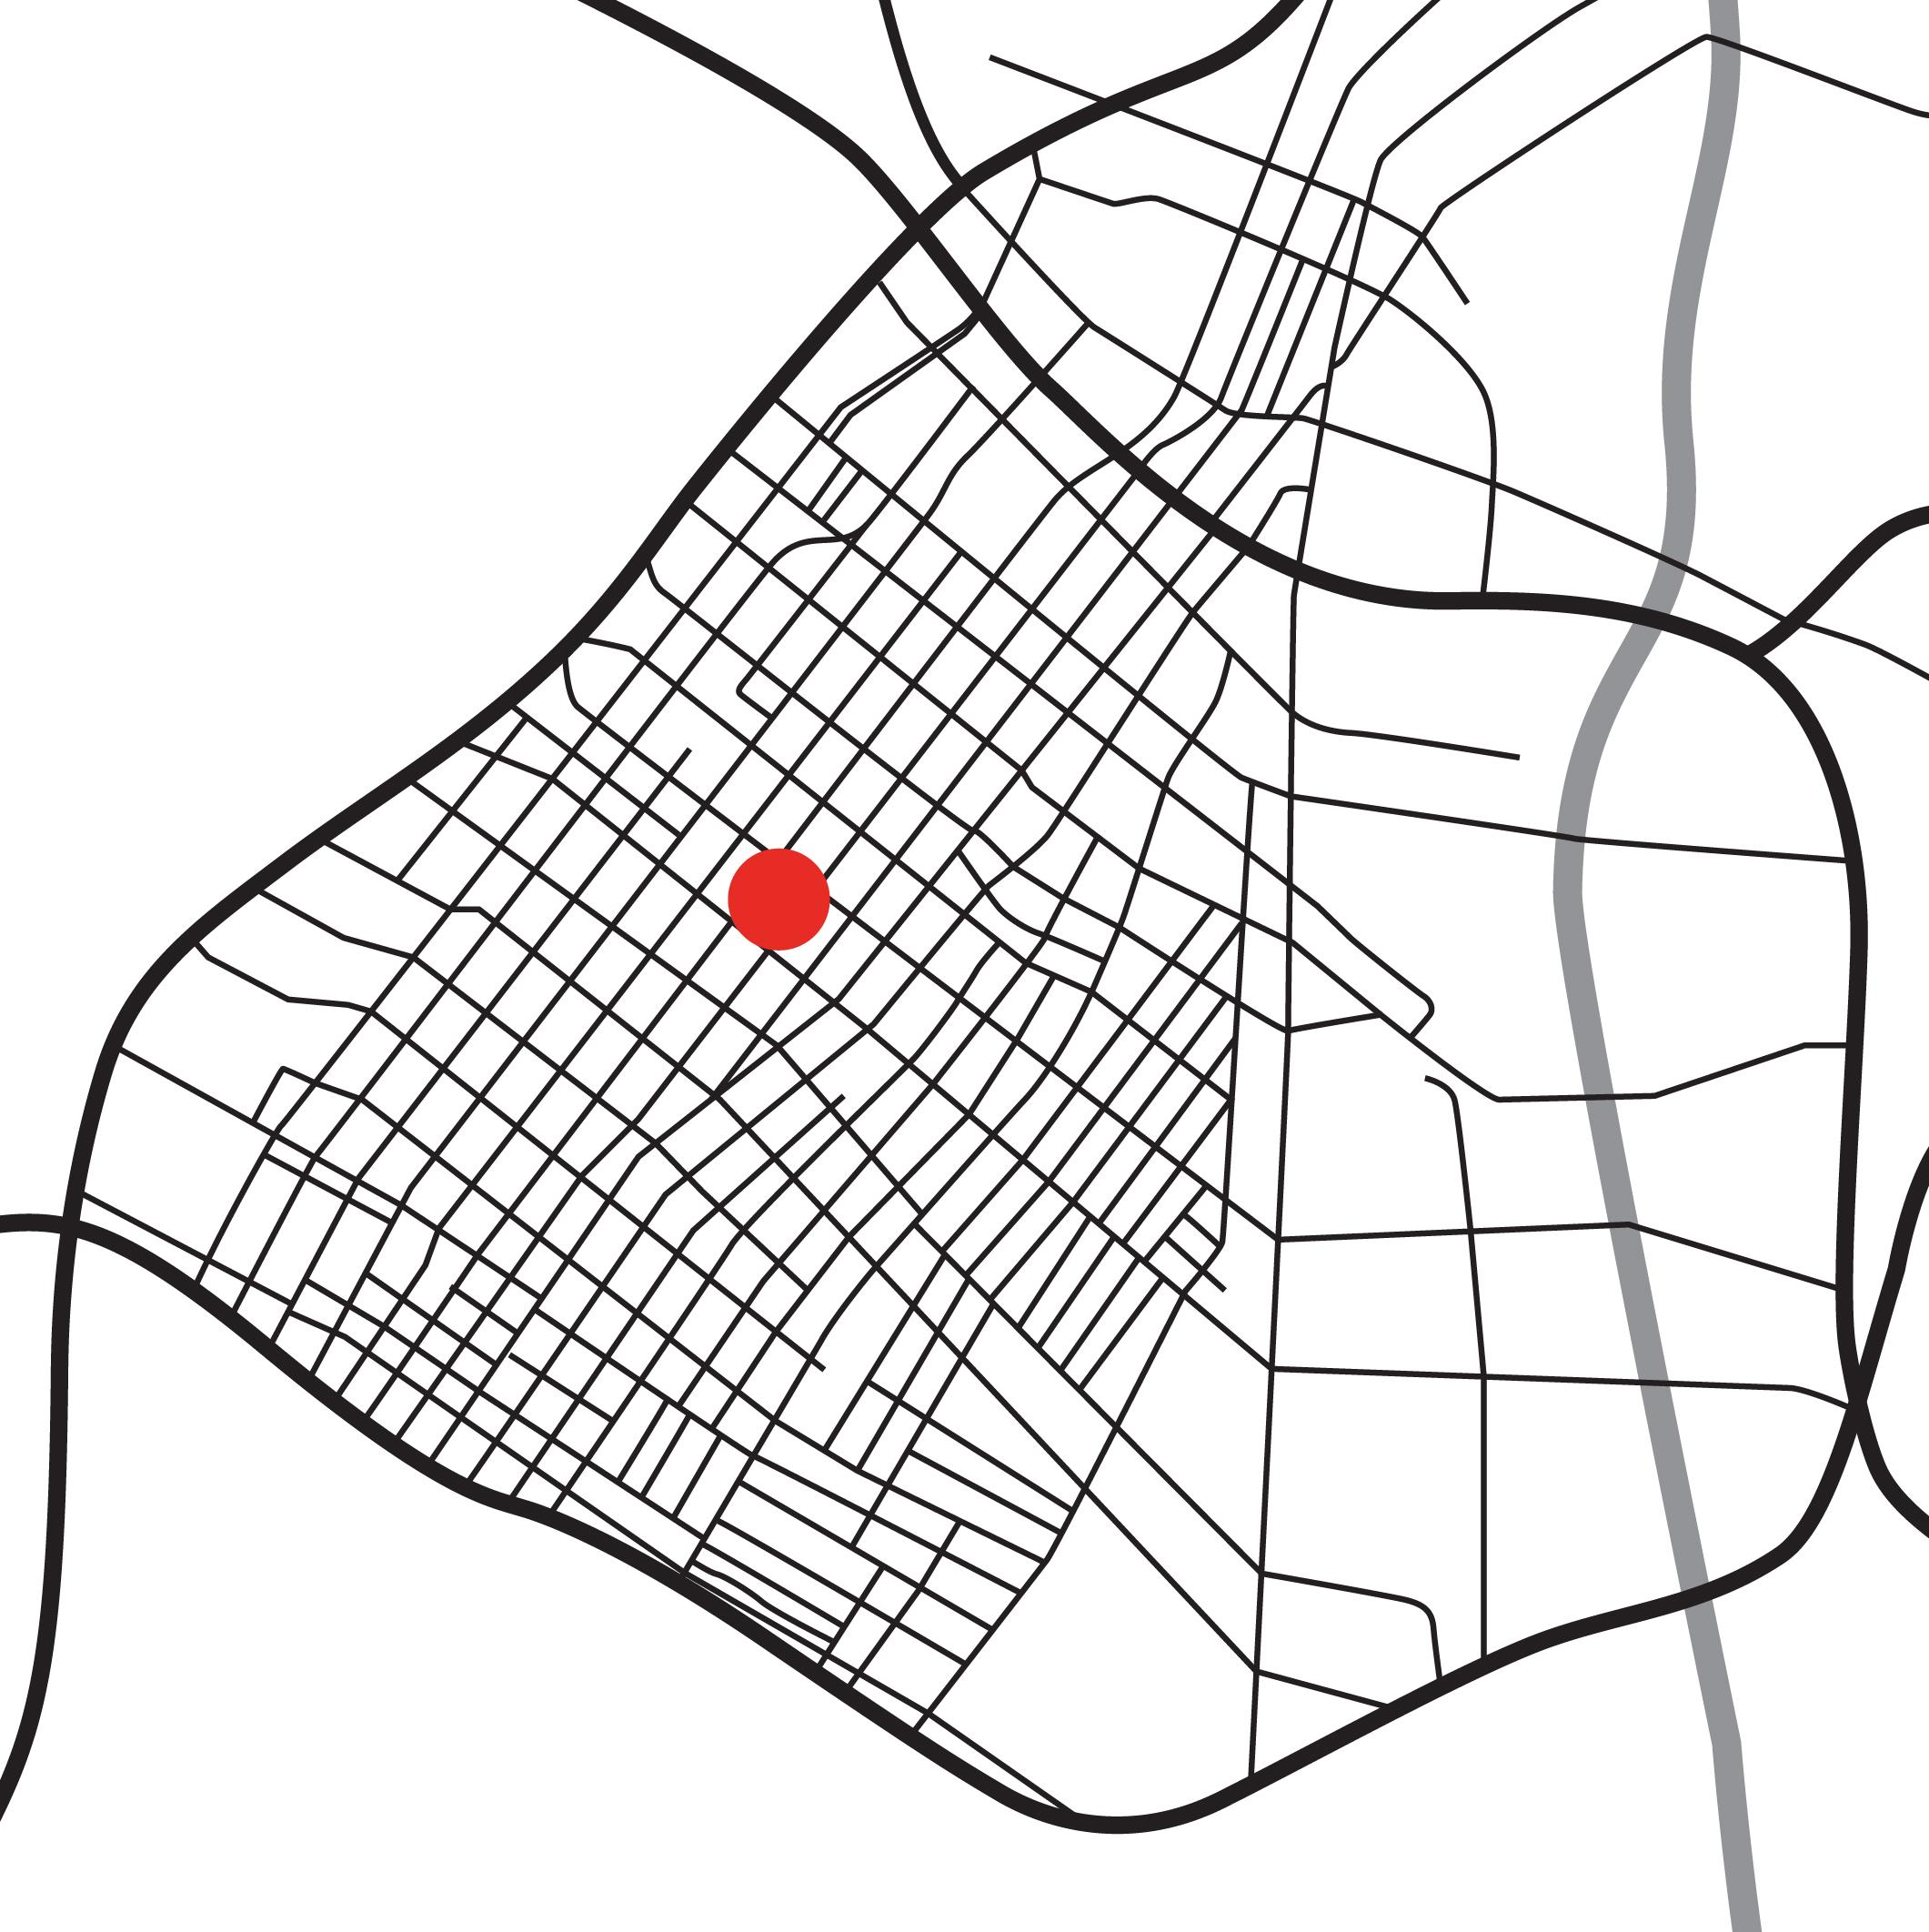 DTLA_MAP_003_Los Angeles Theatre-01.jpg